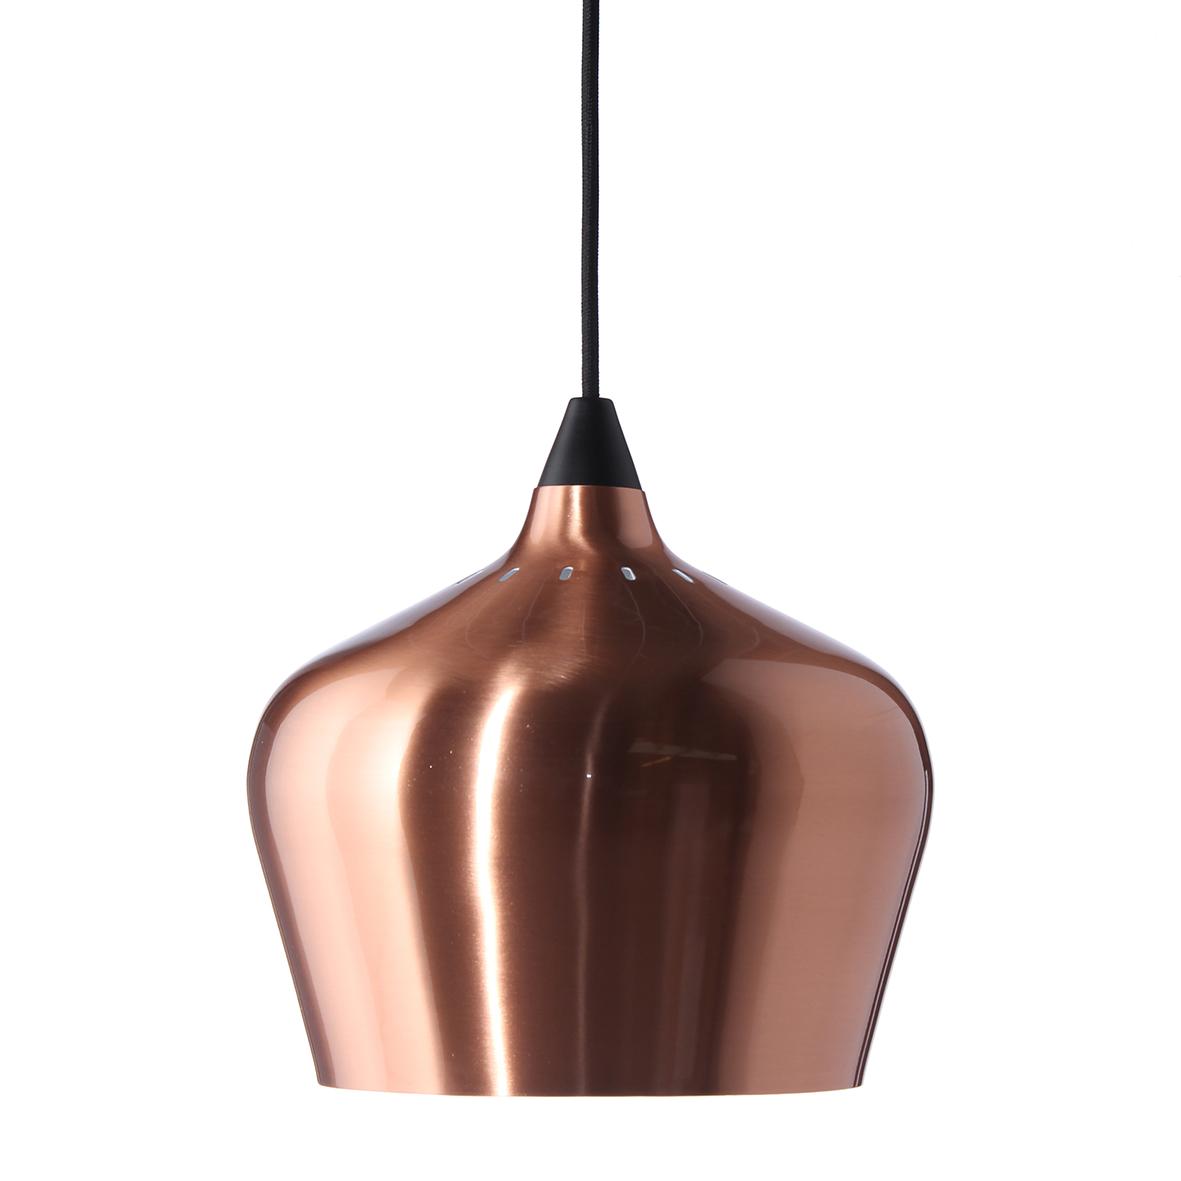 Lustra Cohen Large Copper Glossy, Ø 25 cm